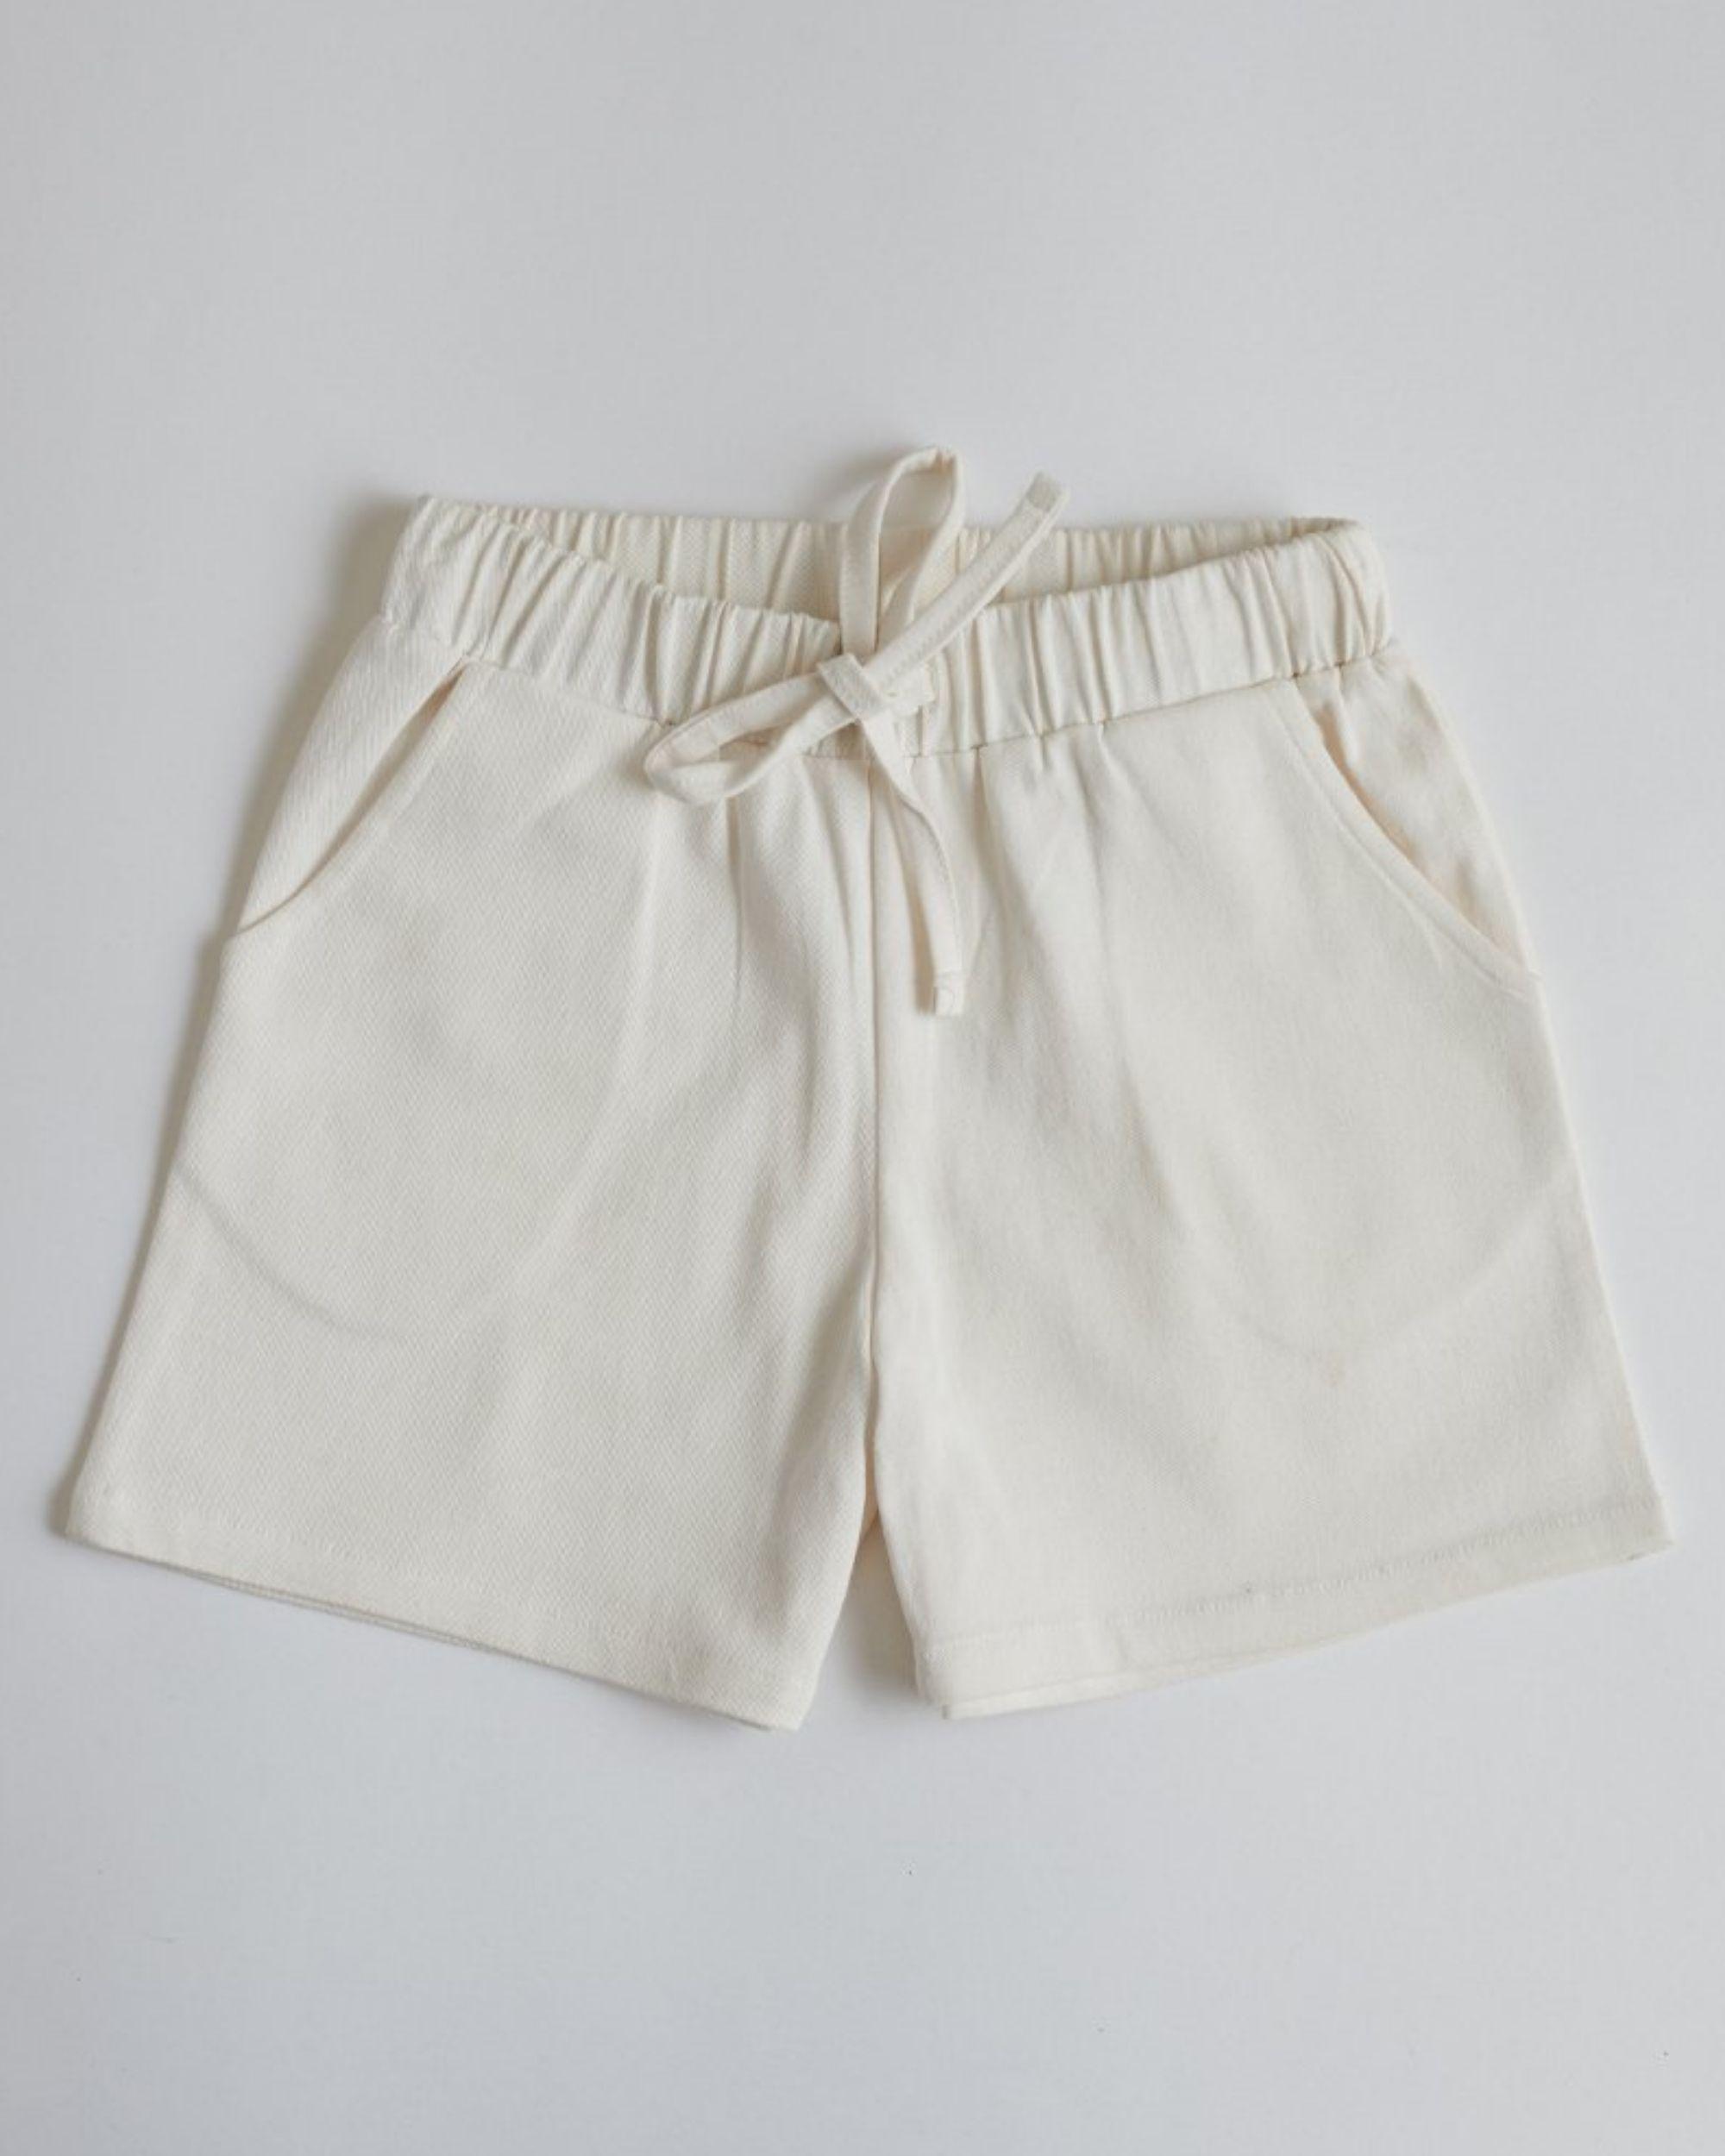 White organic cotton shorts